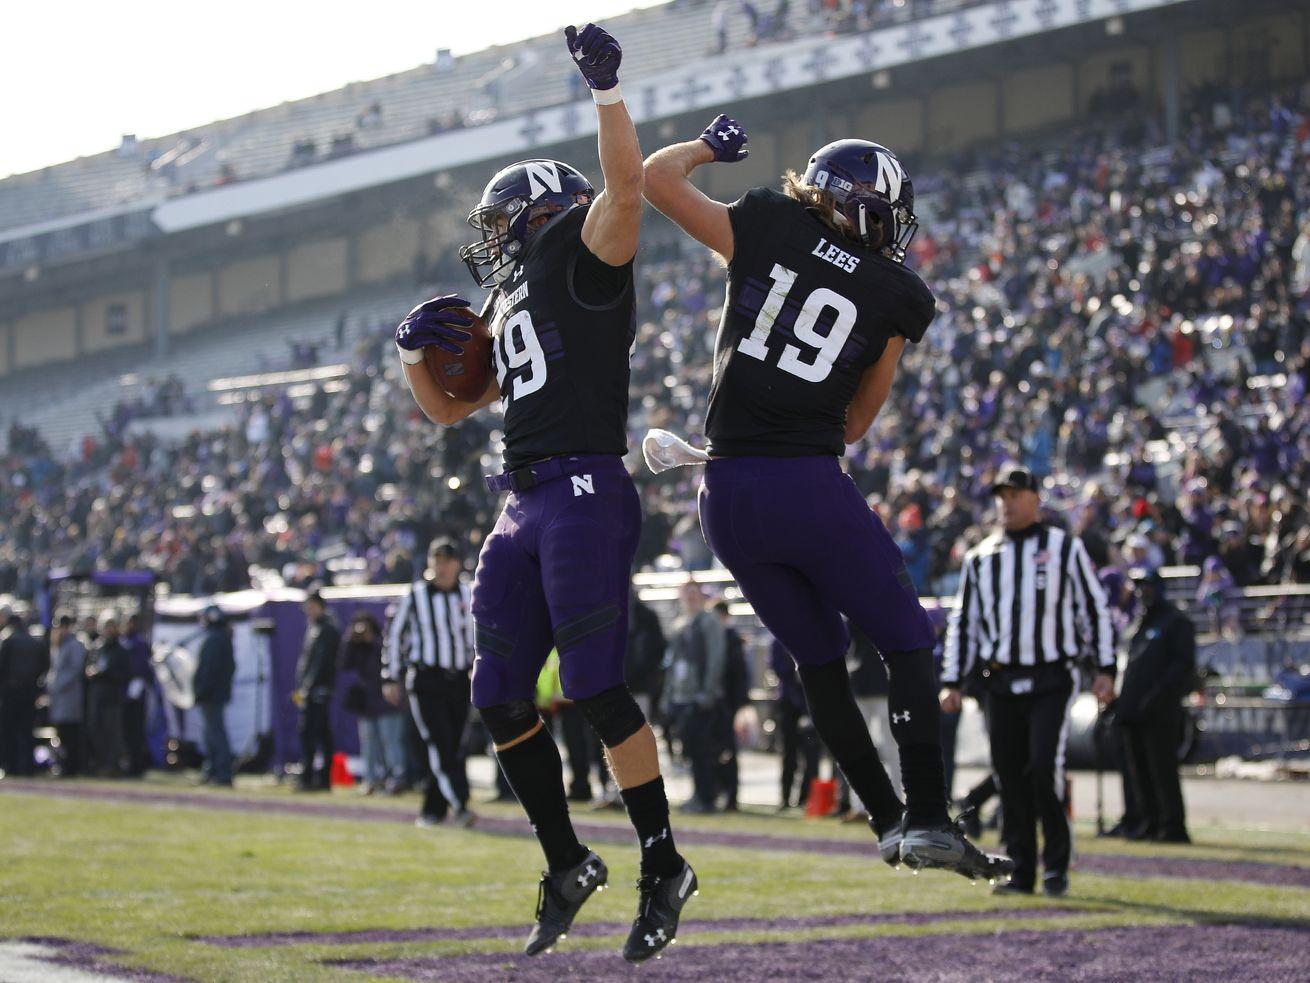 Northwestern's Tyler Haskin, left, celebrates his touchdown against Massachusetts with teammate Riley Lees.